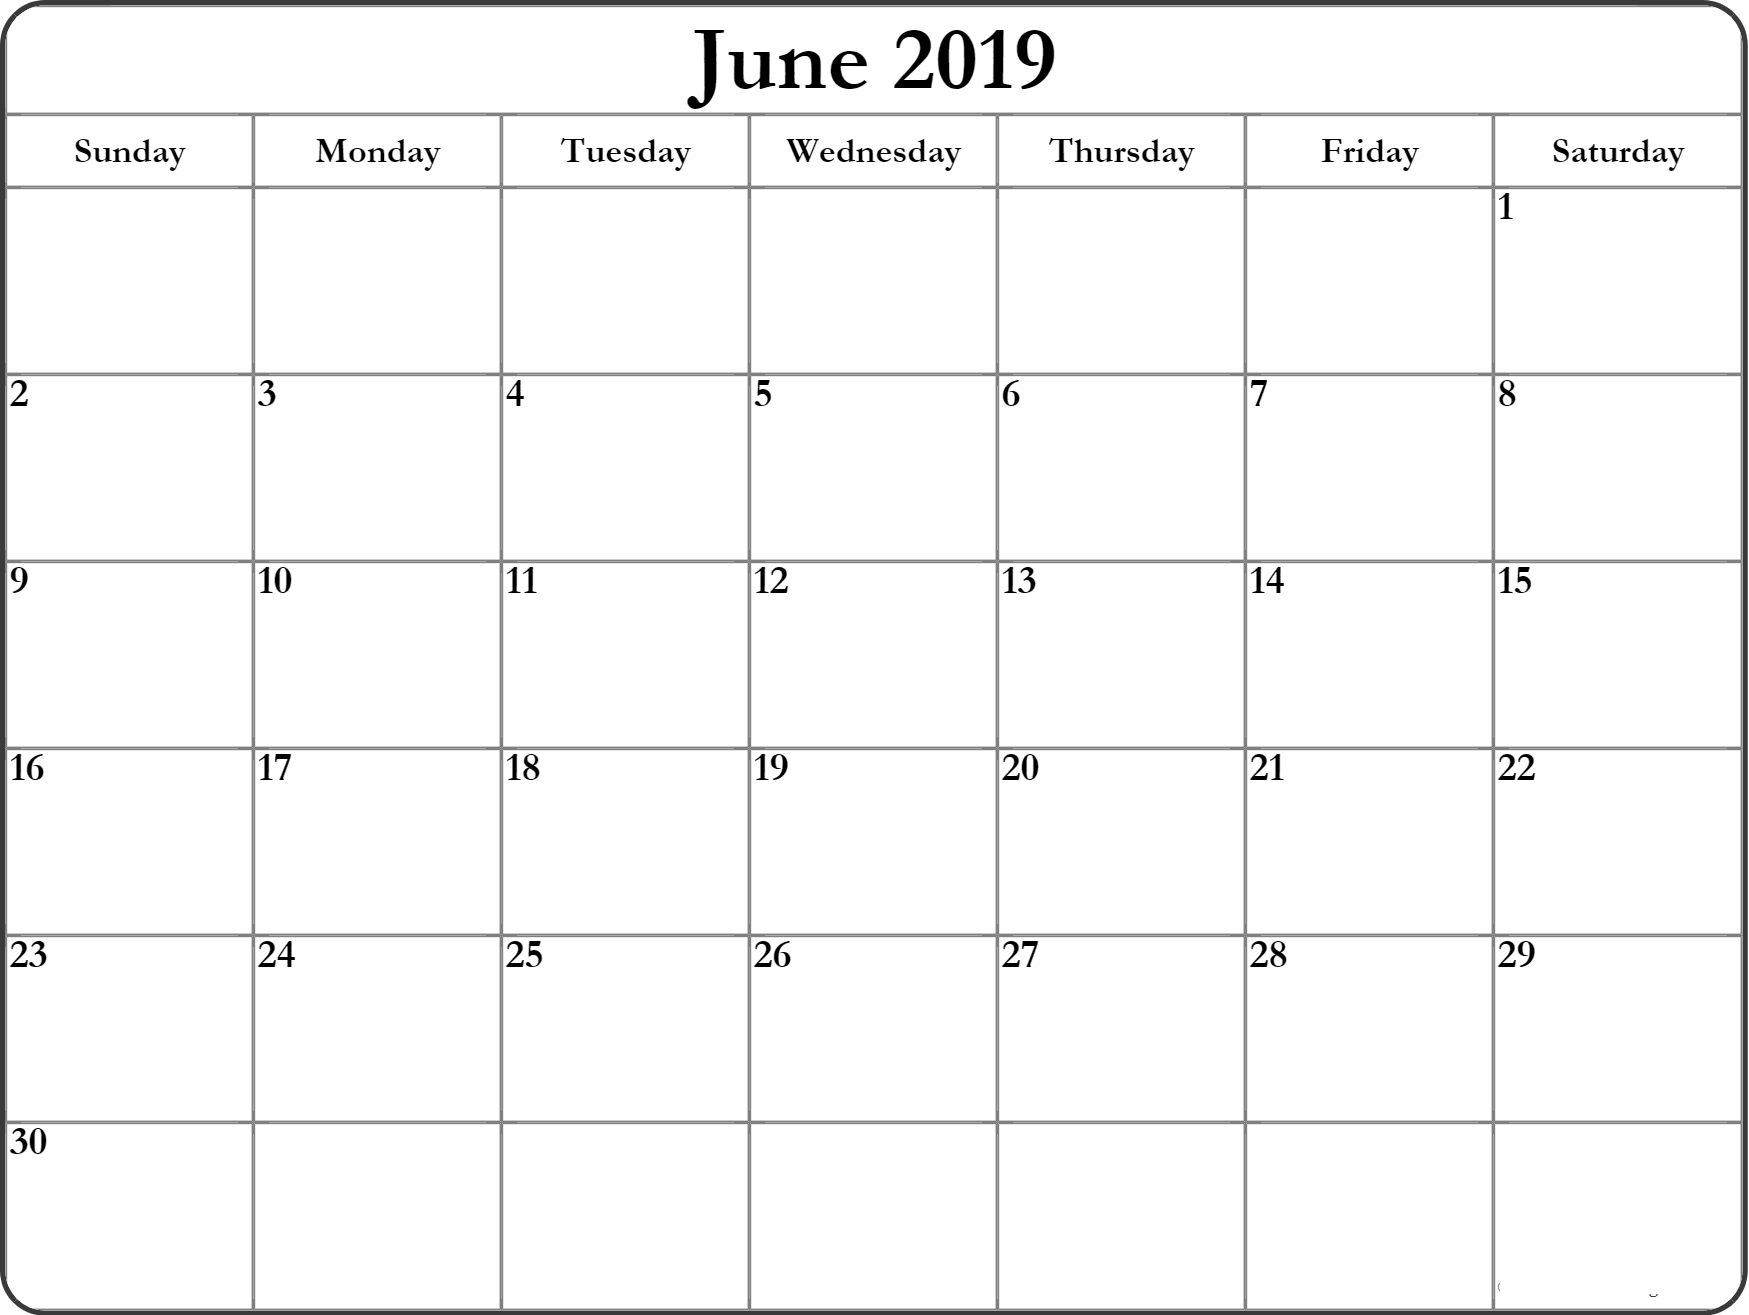 June 2019 Printable Calendar Blank Templates - Calendar Hour - 2019 within June Calendar Printable Template